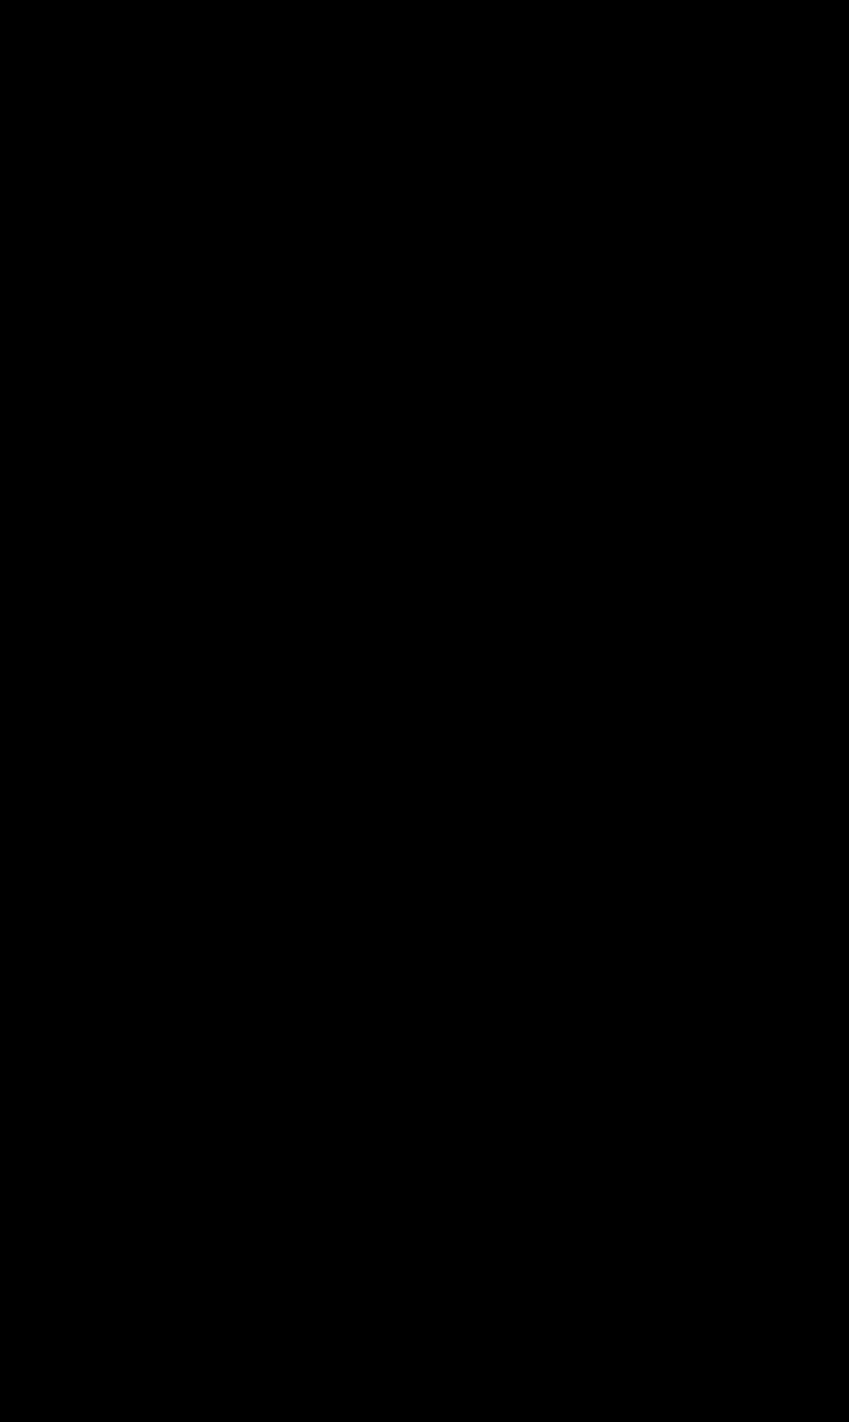 Medicom RAH Star Wars 4-LOM 1:6 Scale Figure